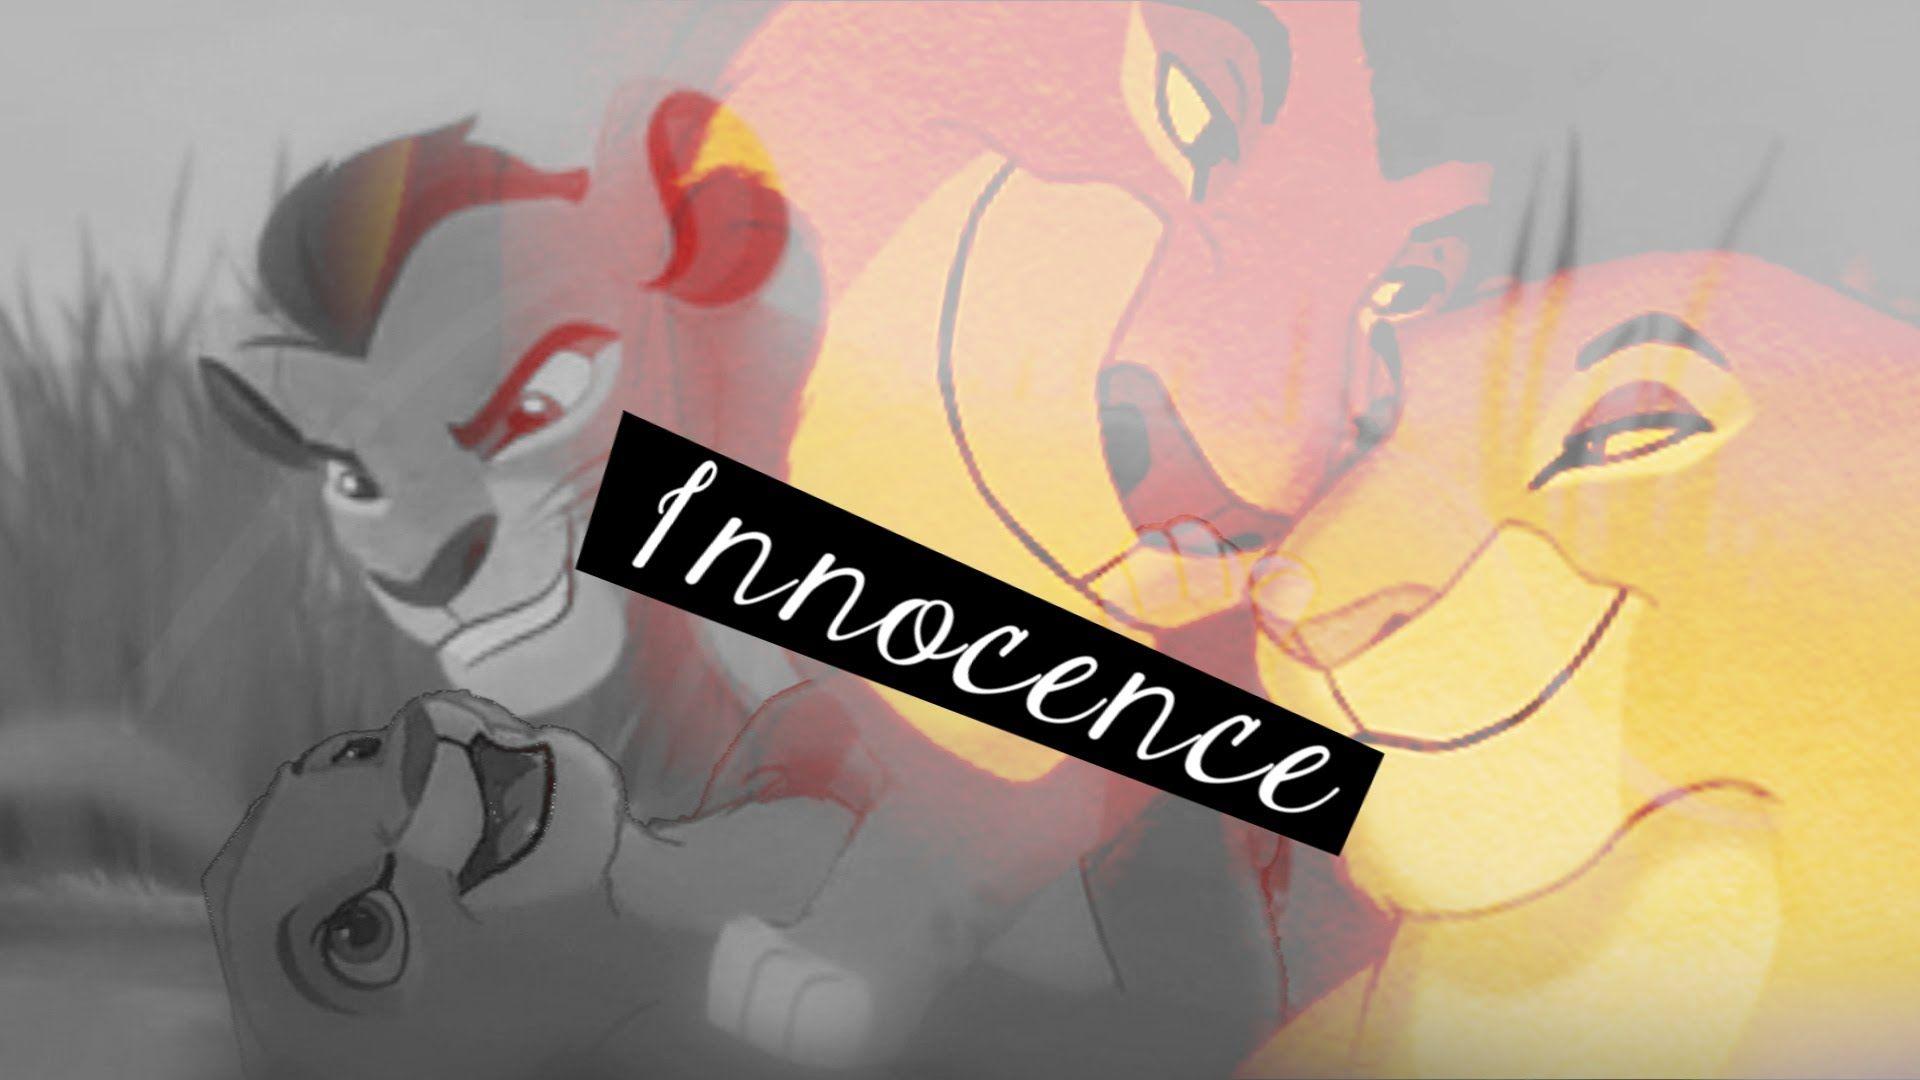 Innocence ( MufasaxSarabi )